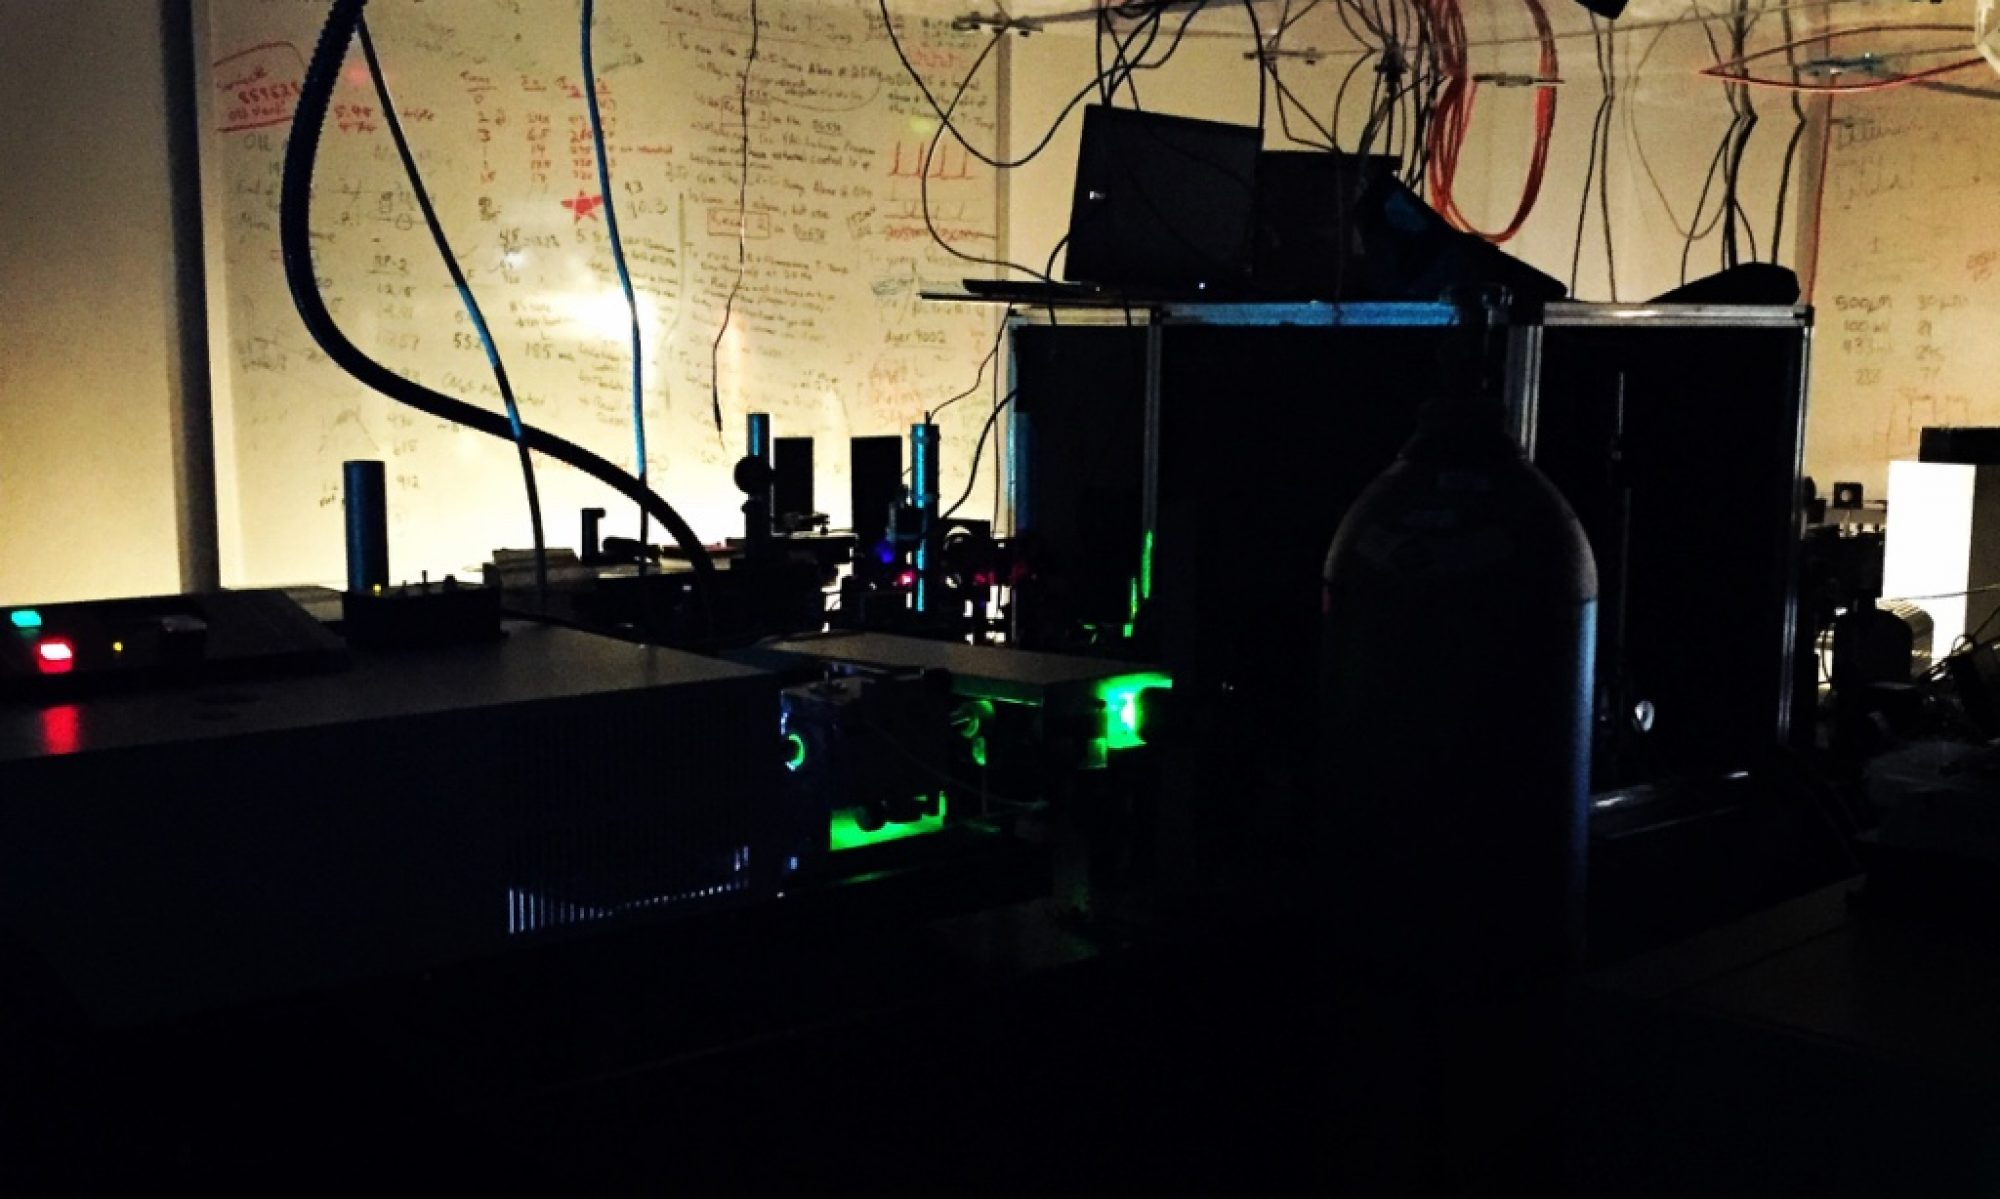 Dyer lab